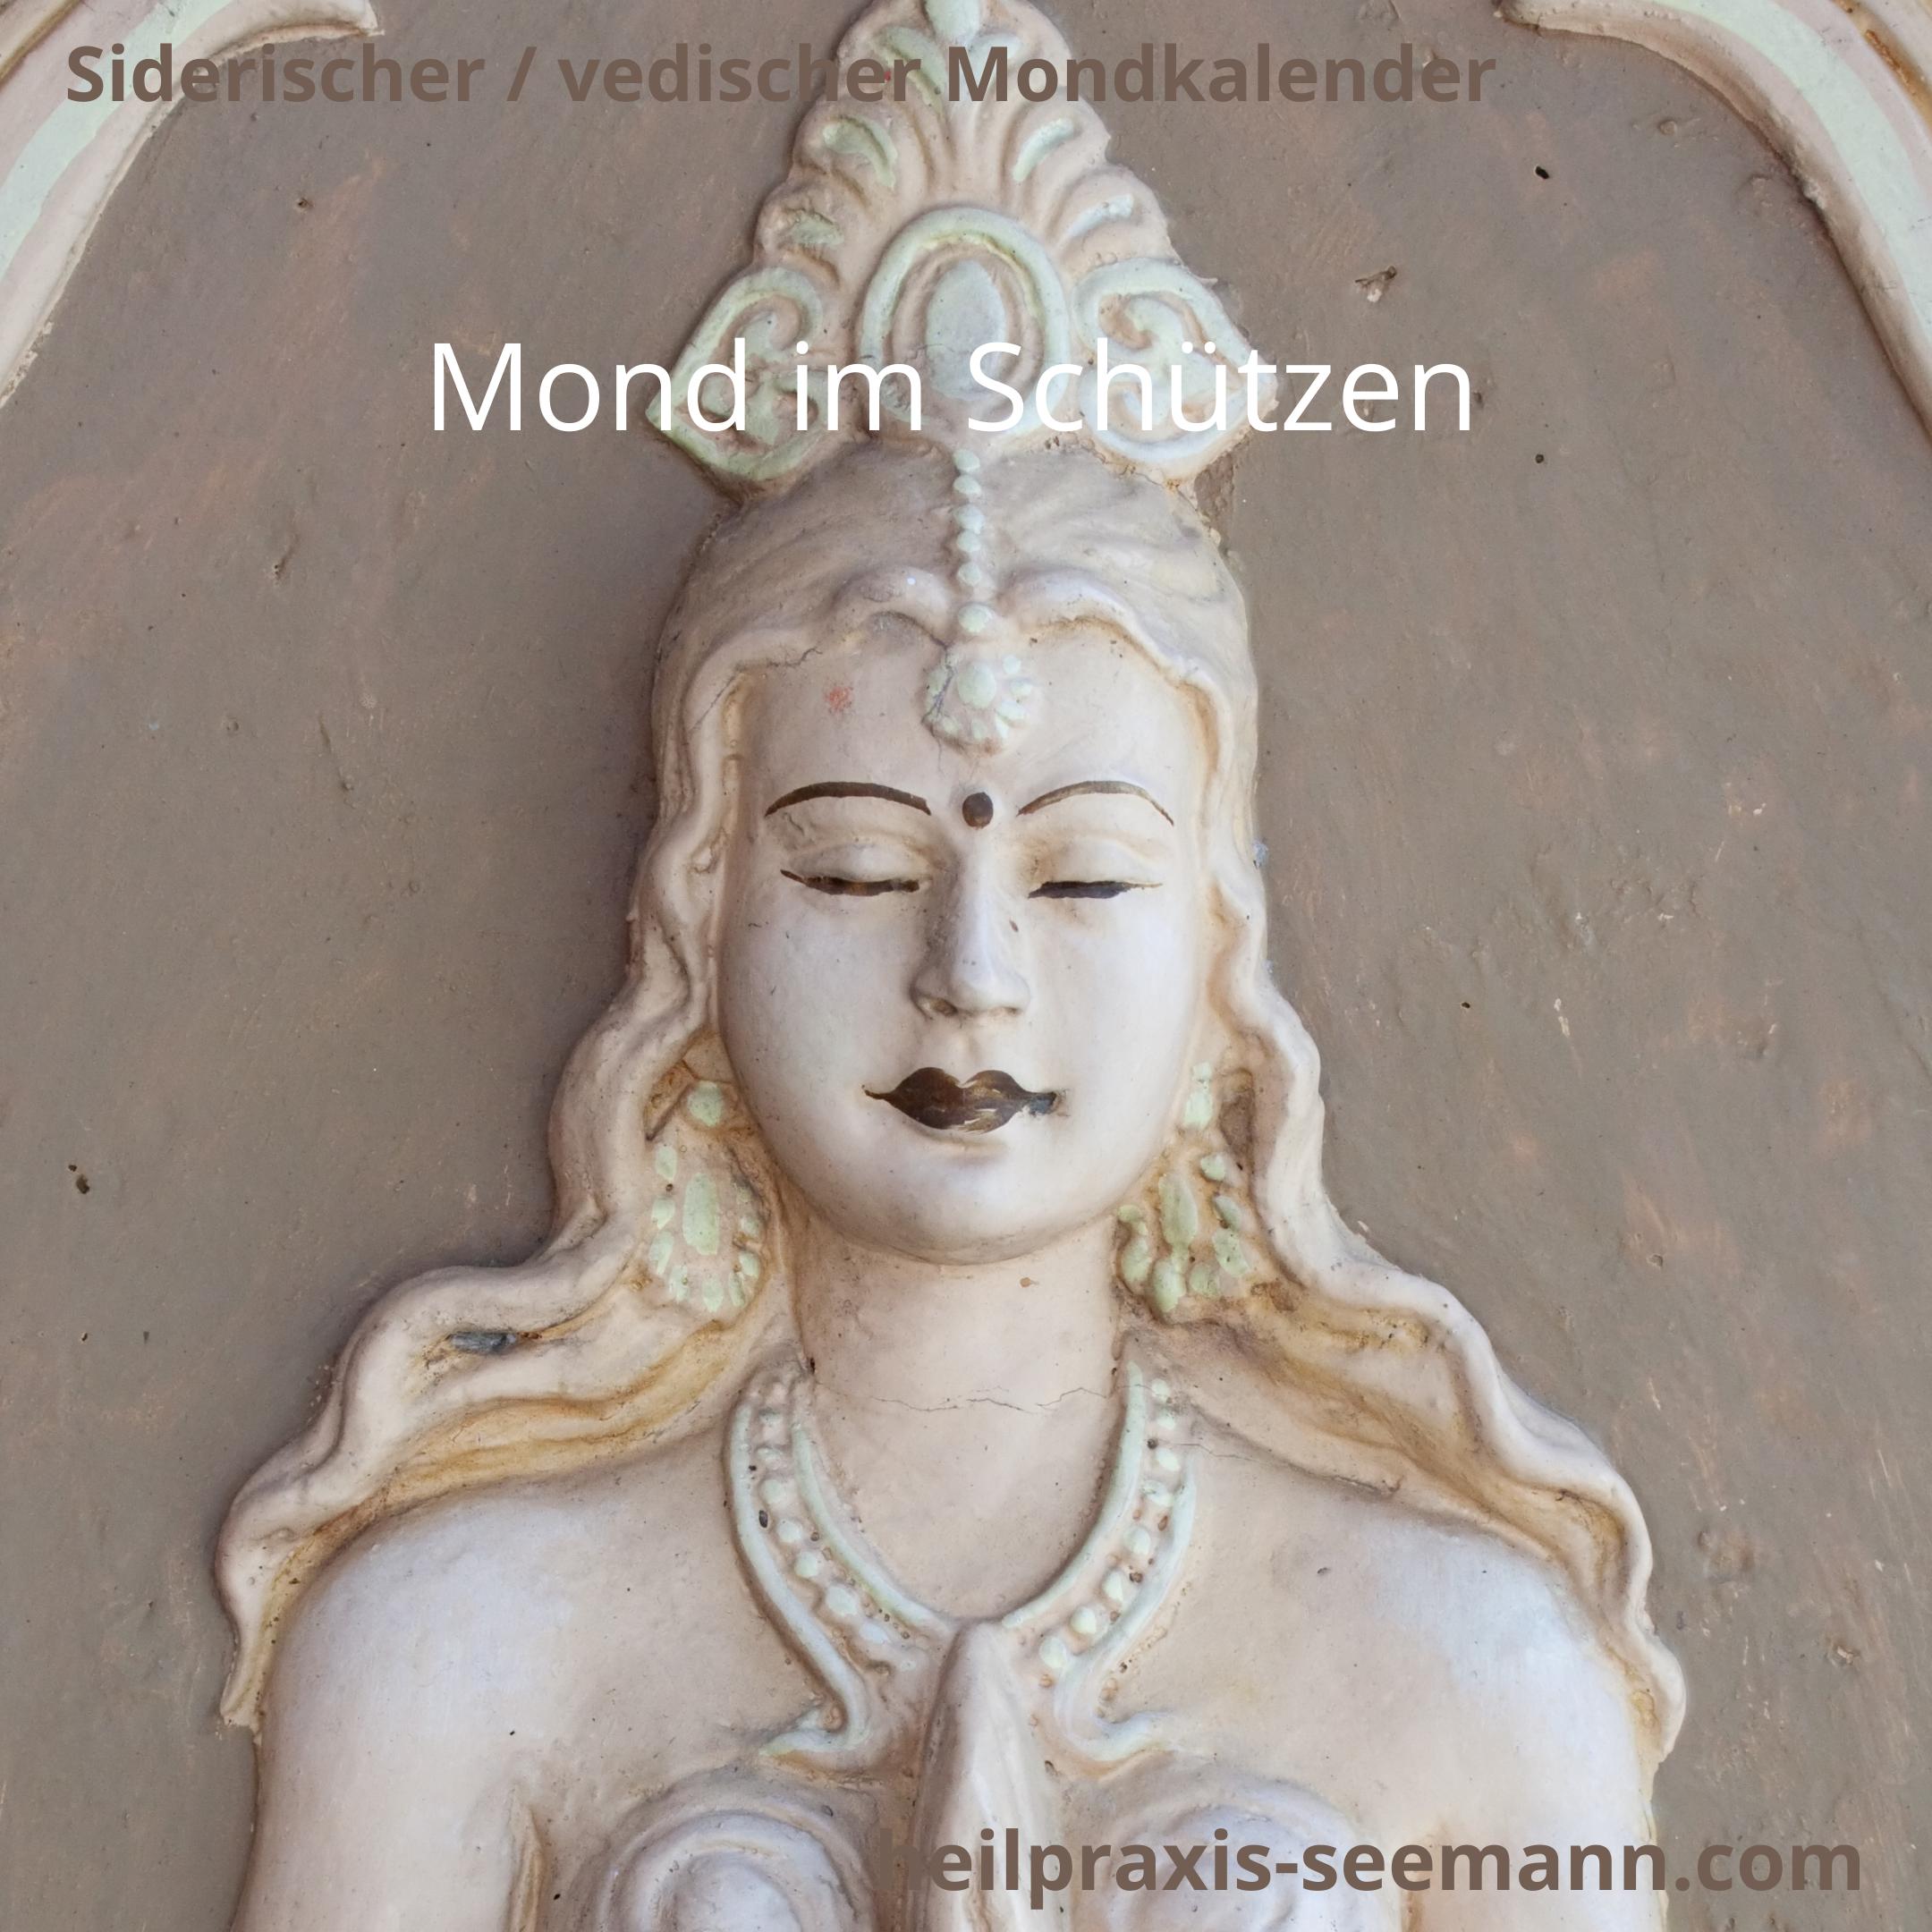 Siderische Mondkalende purva ashada